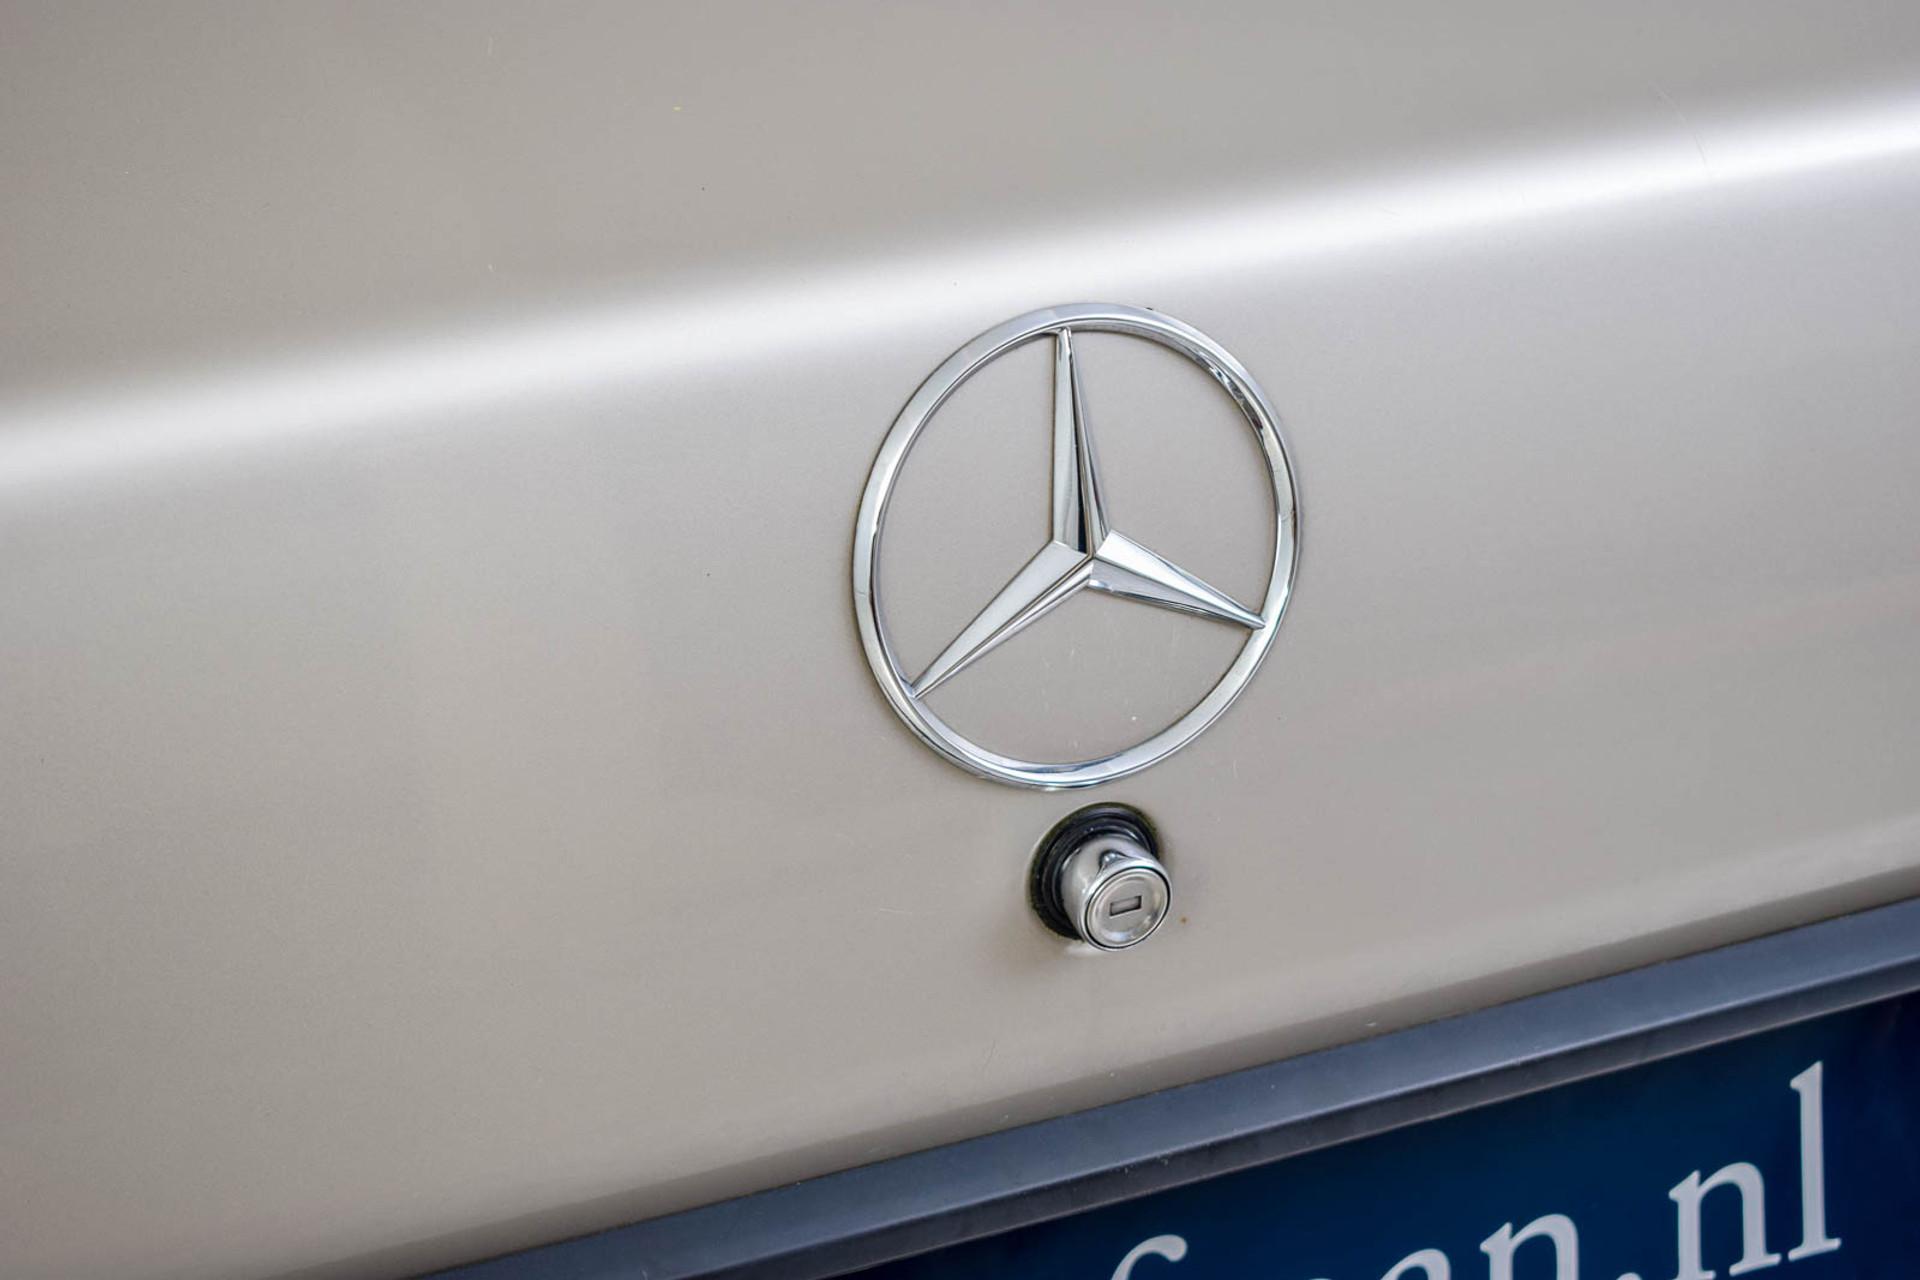 Mercedes-Benz 190 2.5 D Turbo Diesel Foto 12